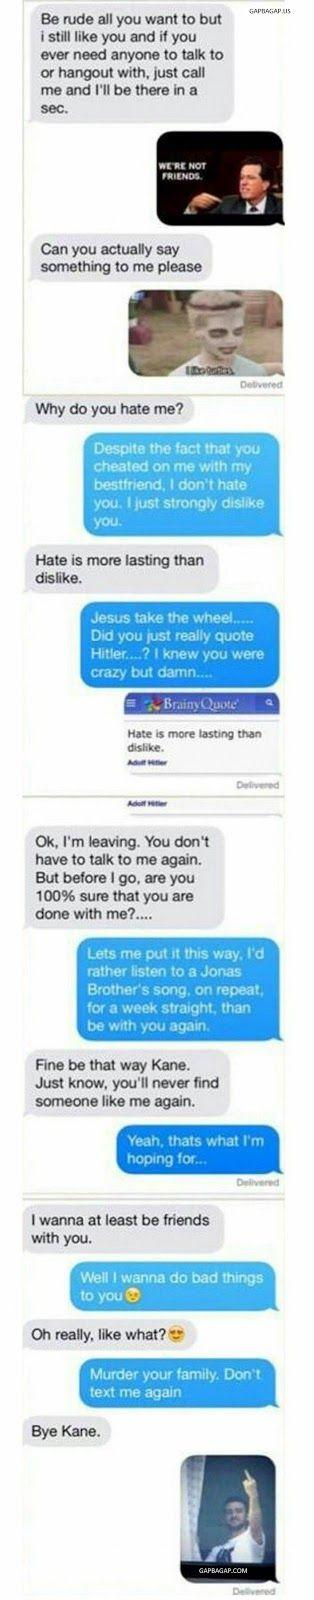 5+ Hilarious Text Message About Ex